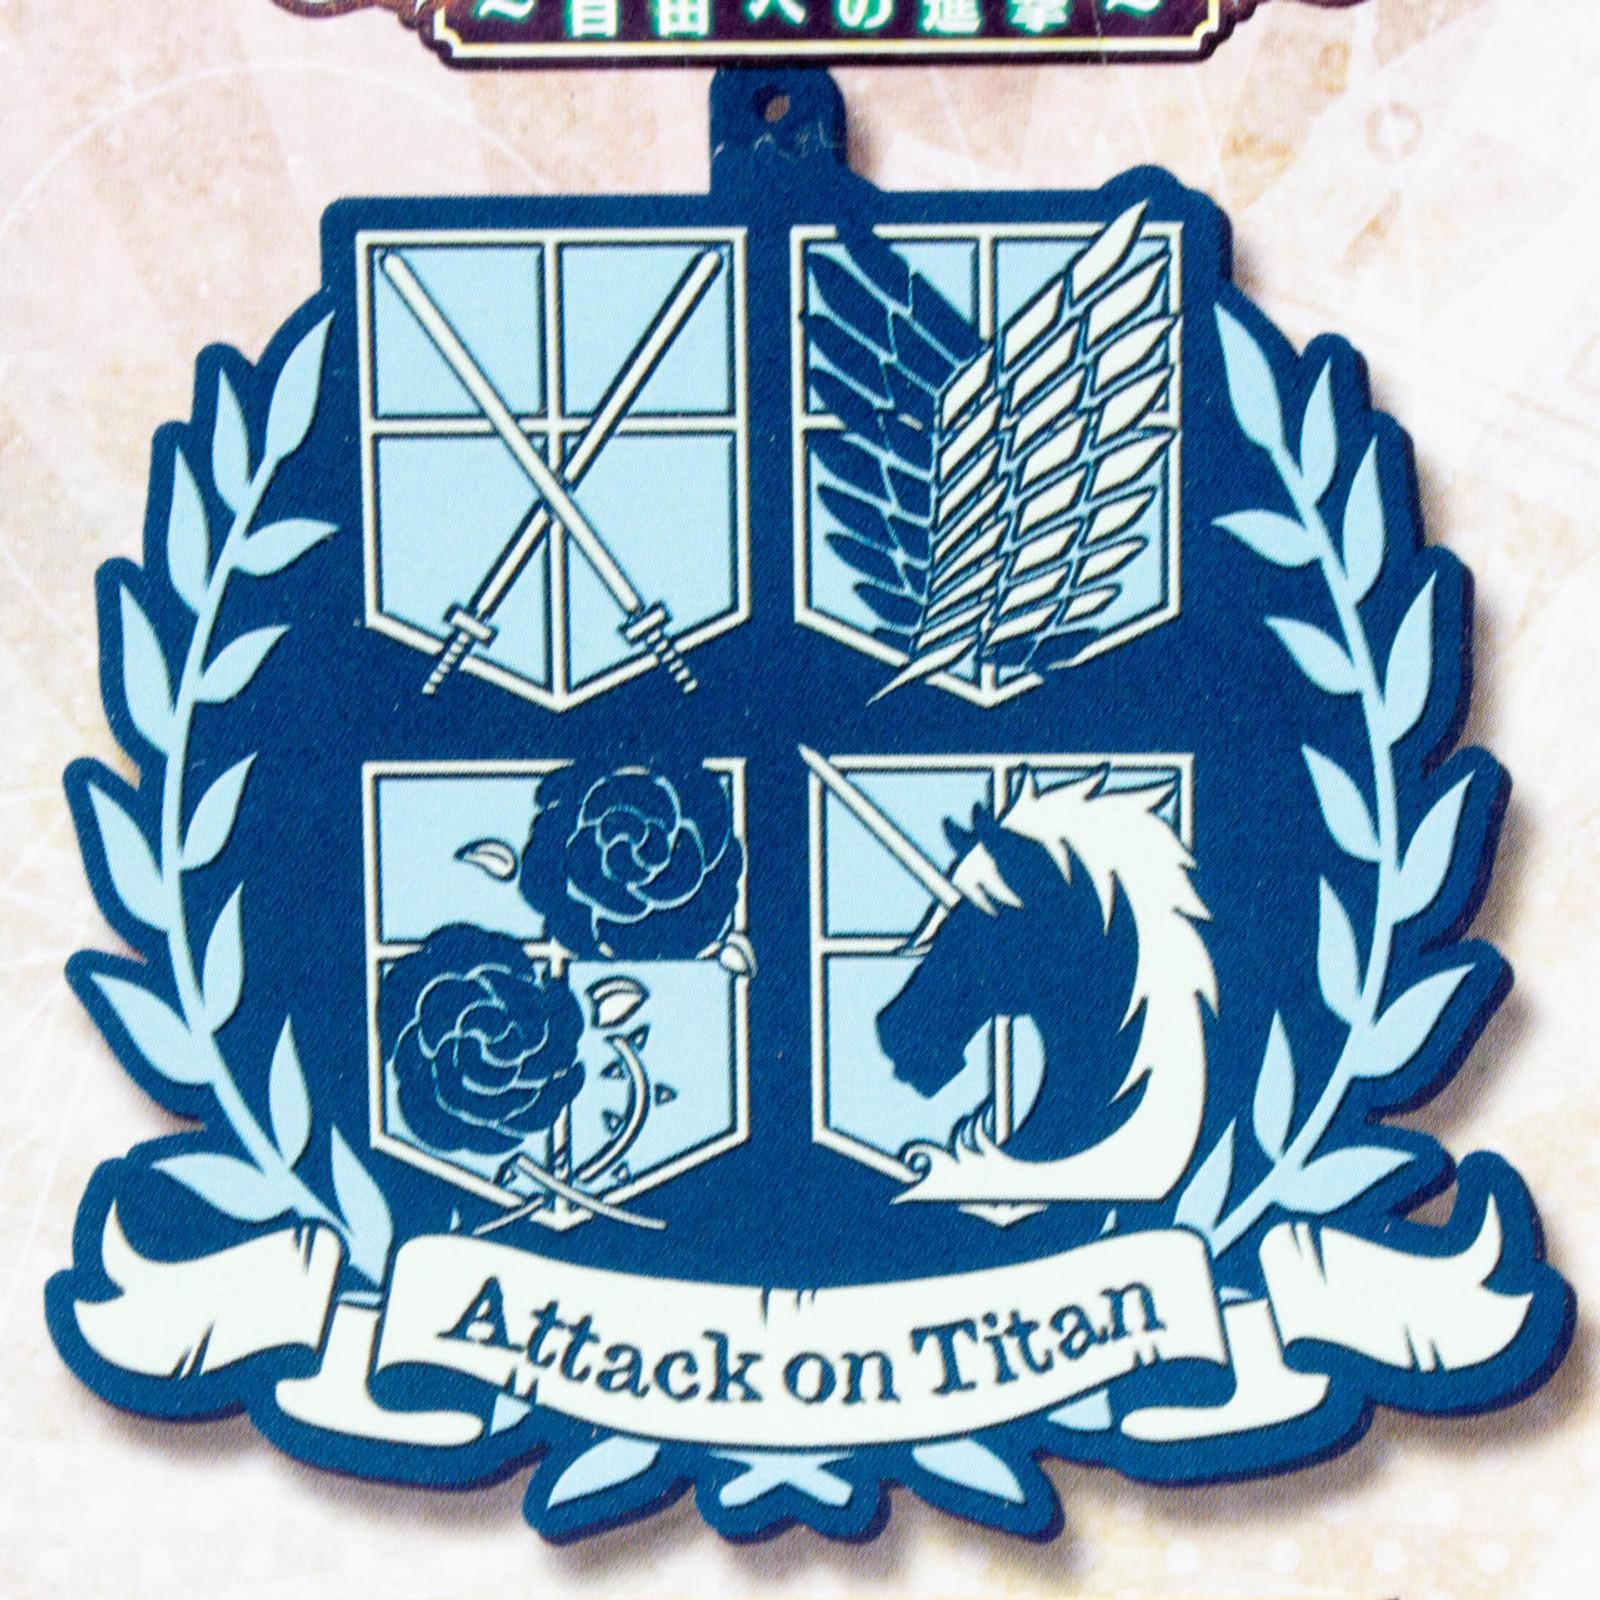 Attack on Titan Rubber Coaster Armband Arm Badge Banpresto JAPAN ANIME MANGA